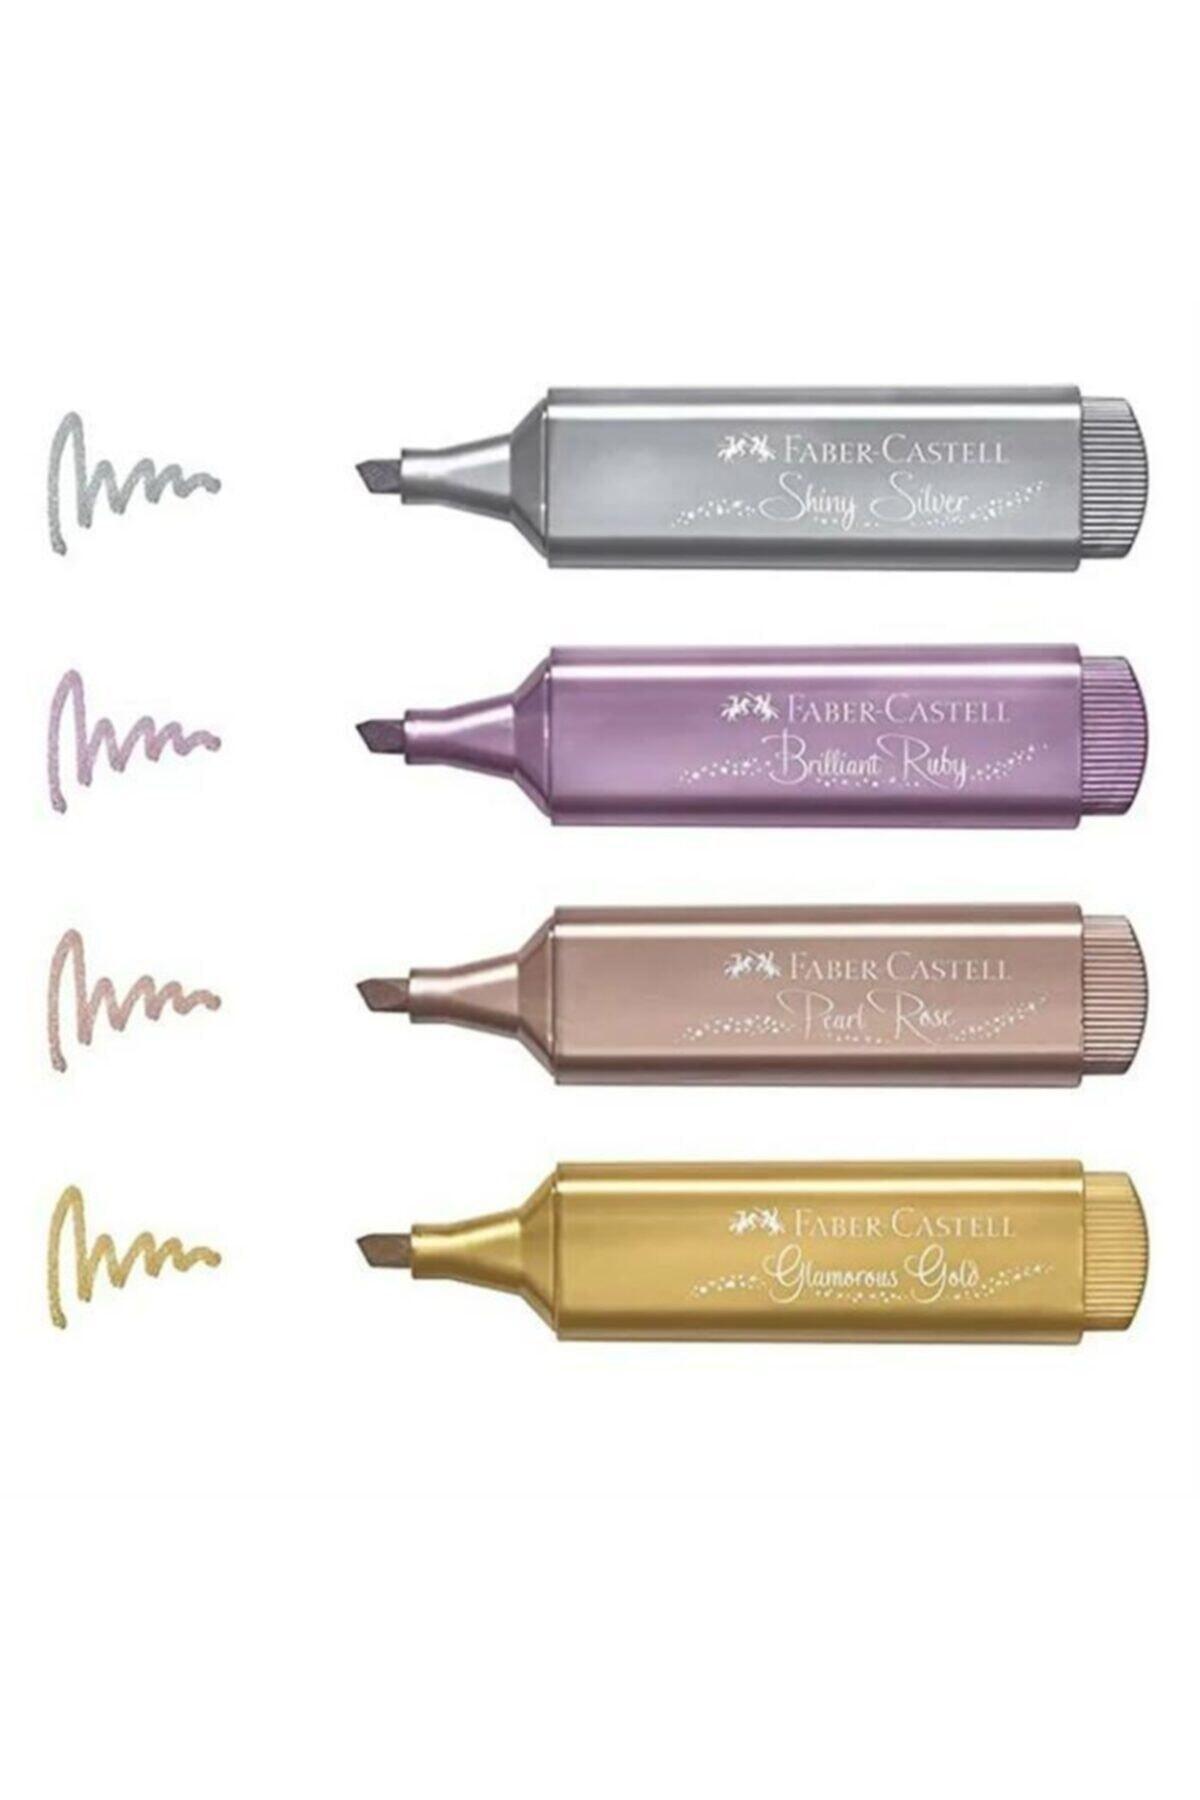 Faber Castell Fosforlu Kalem Metalik Renk 4 Lü 15 46 40 F154640 1